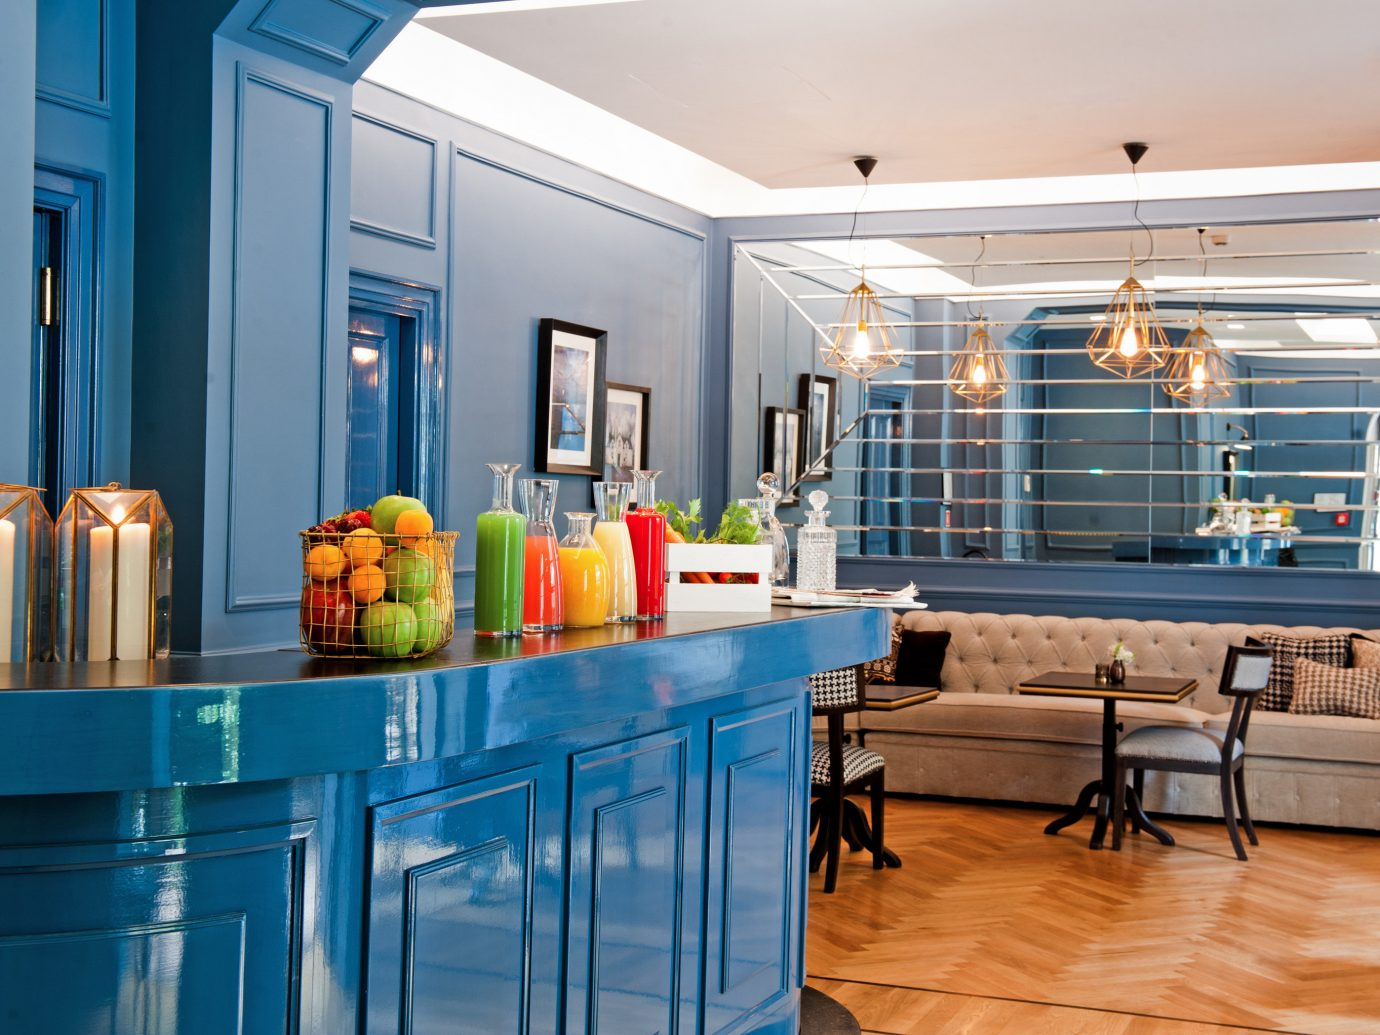 Boutique Hotels Hotels indoor floor room Kitchen interior design home apartment real estate dining room table interior designer